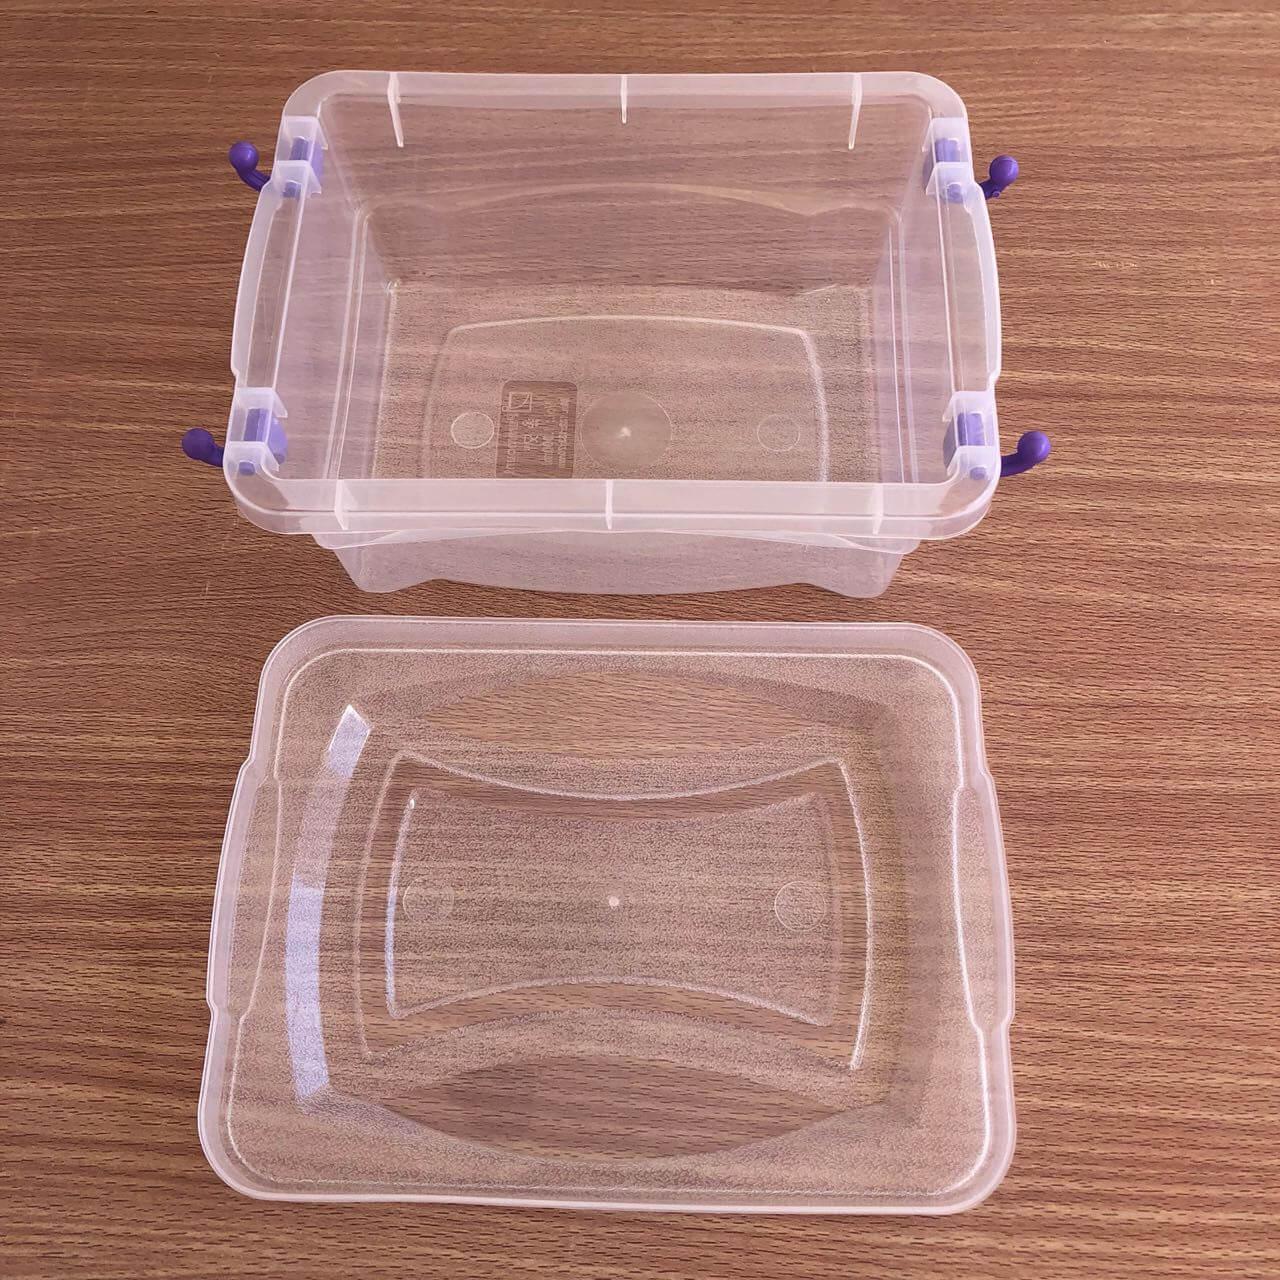 BD04 - Pratic Box 01 Litro  - 01 Unid